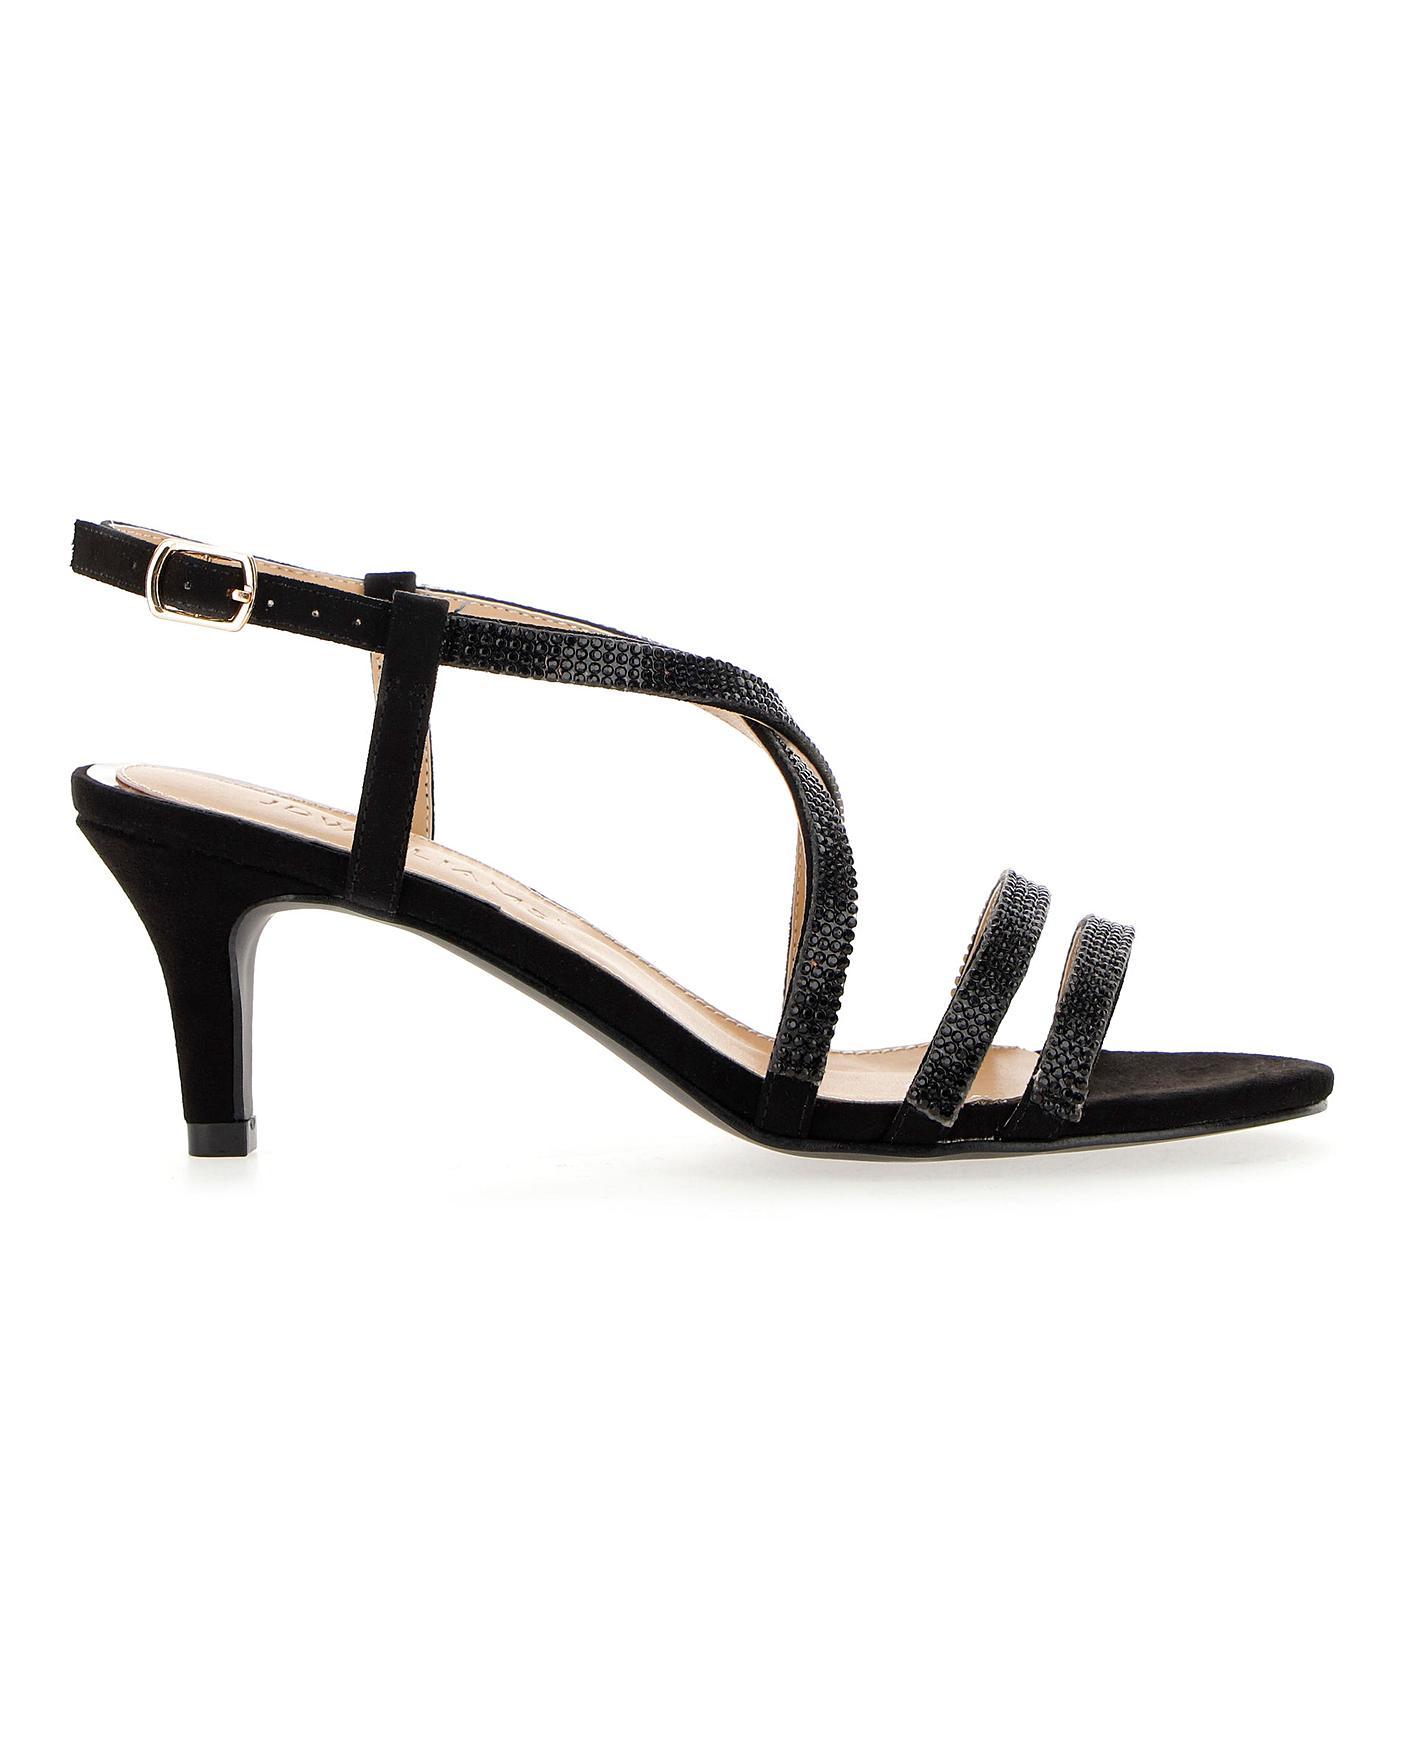 Diamante Detail Strappy Sandals E Fit